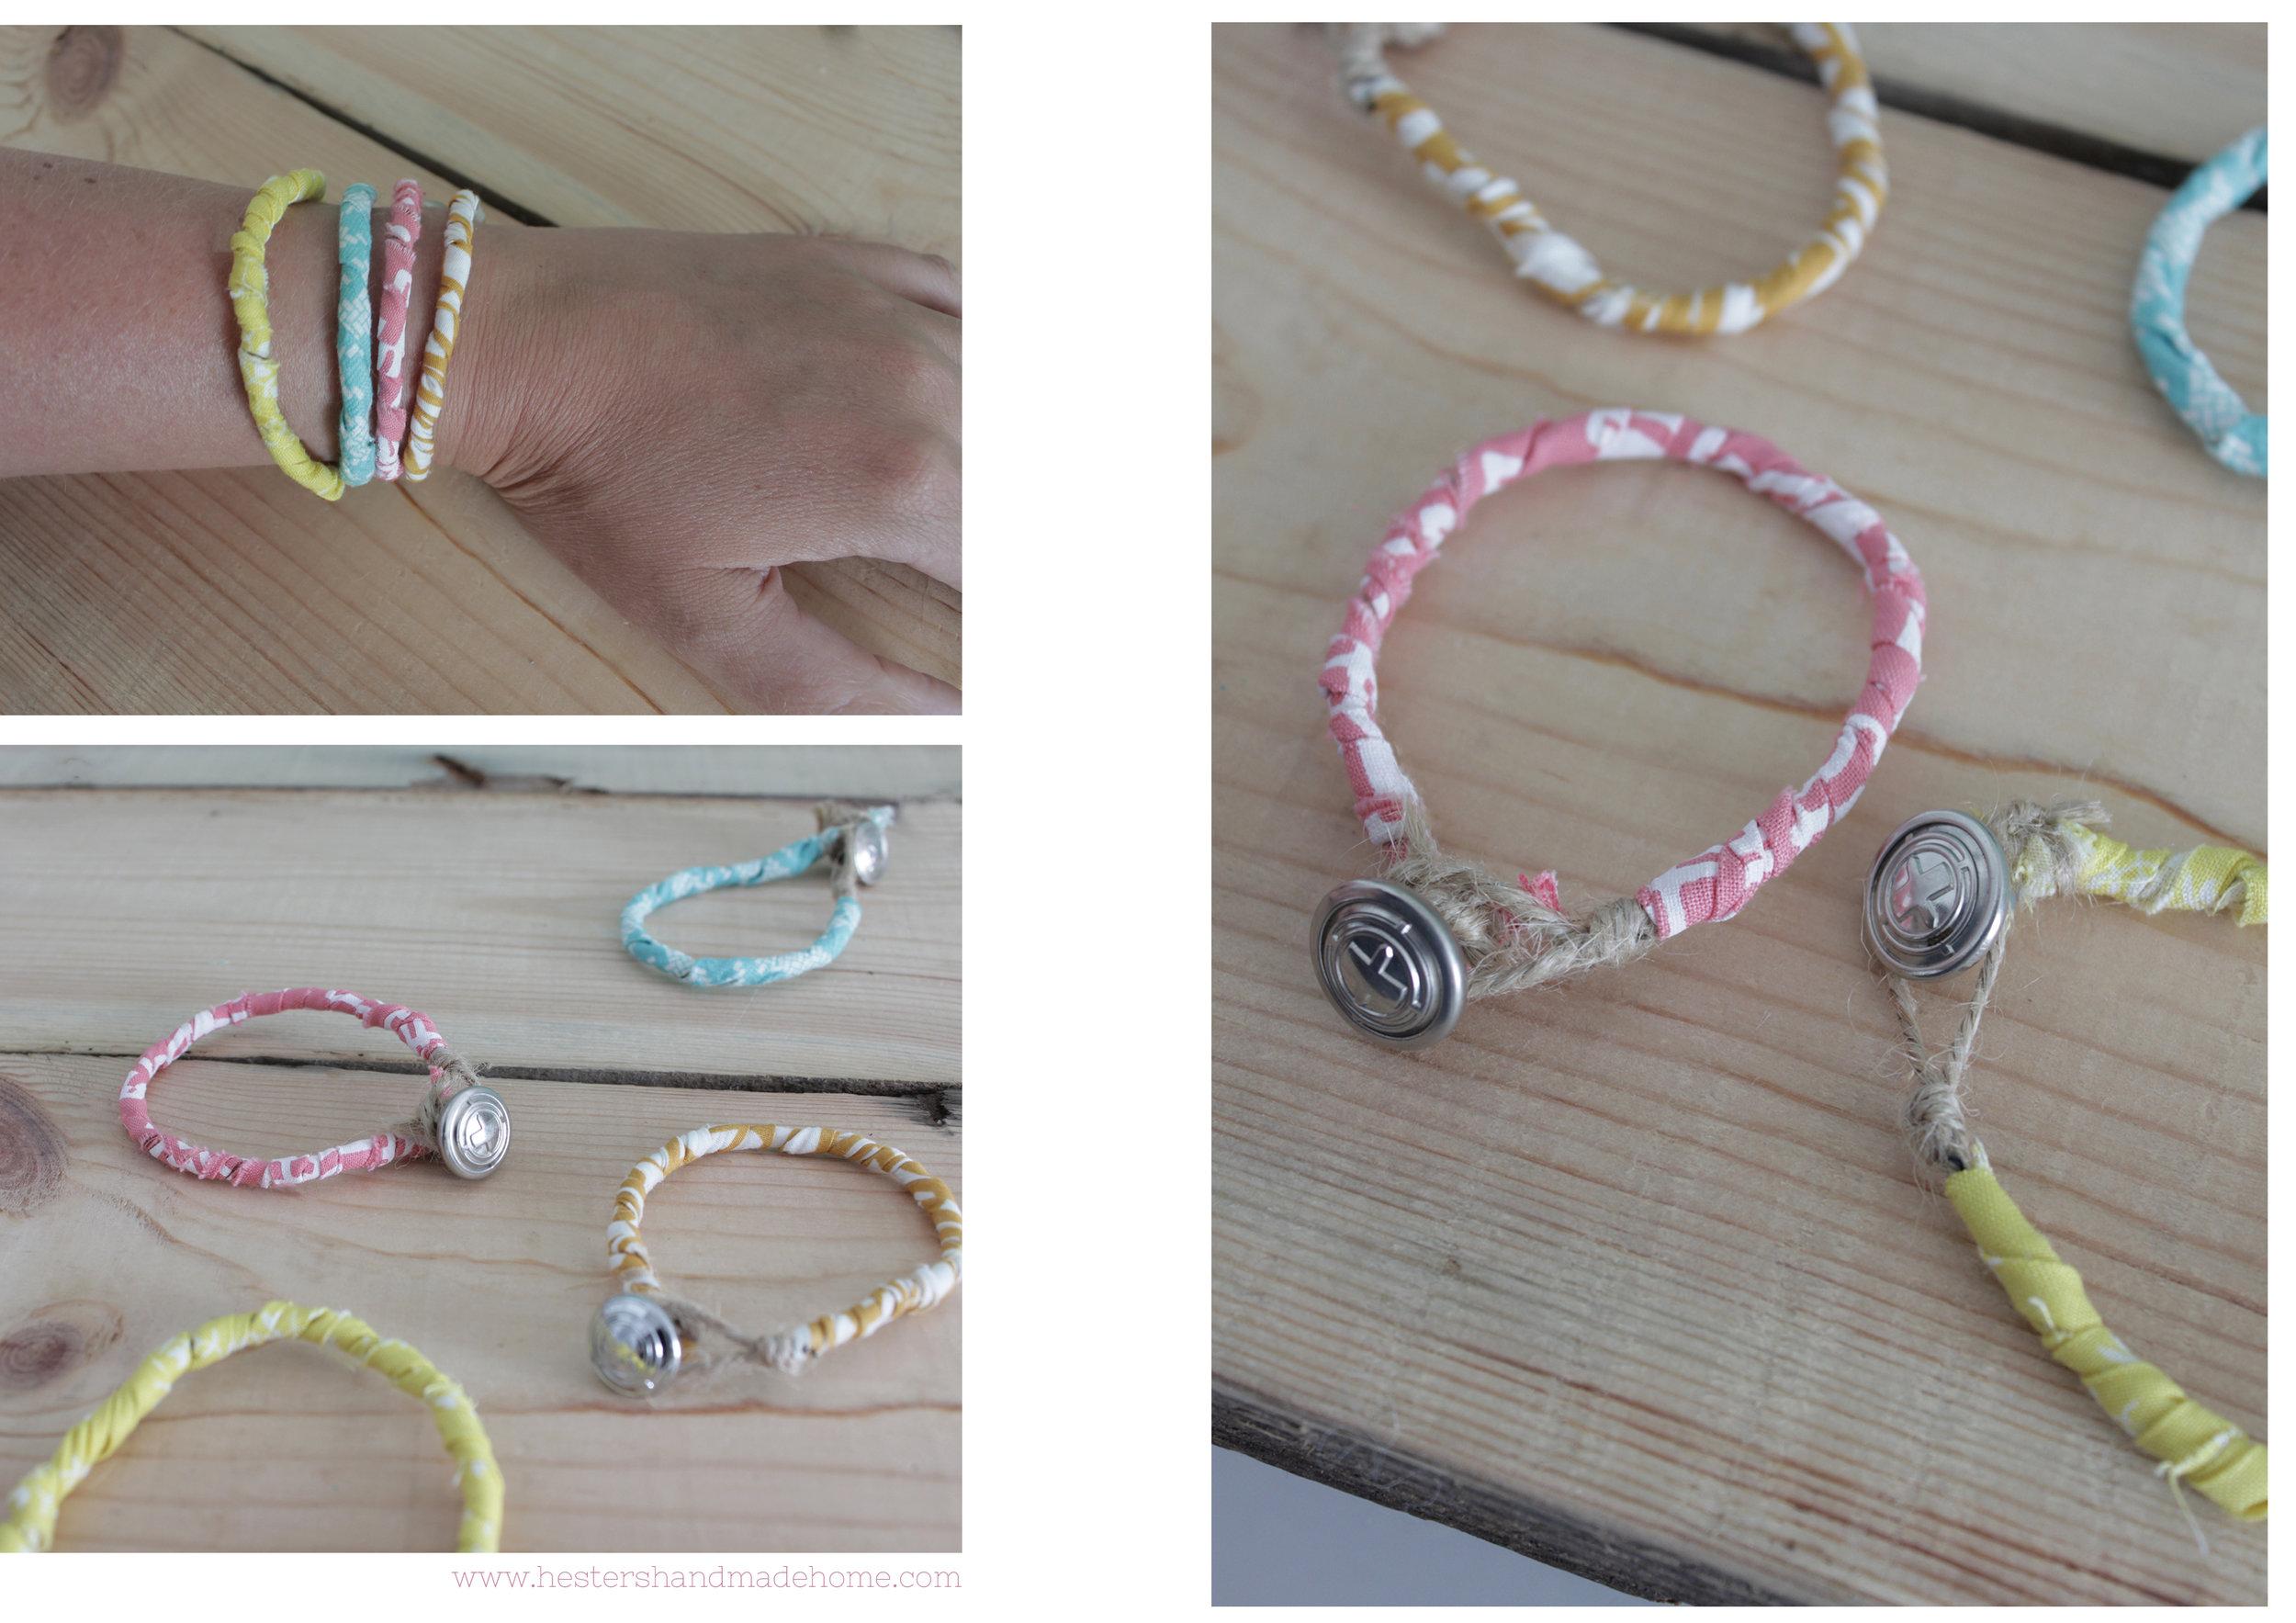 Bracelet tutorial by Hesters Handmade Home